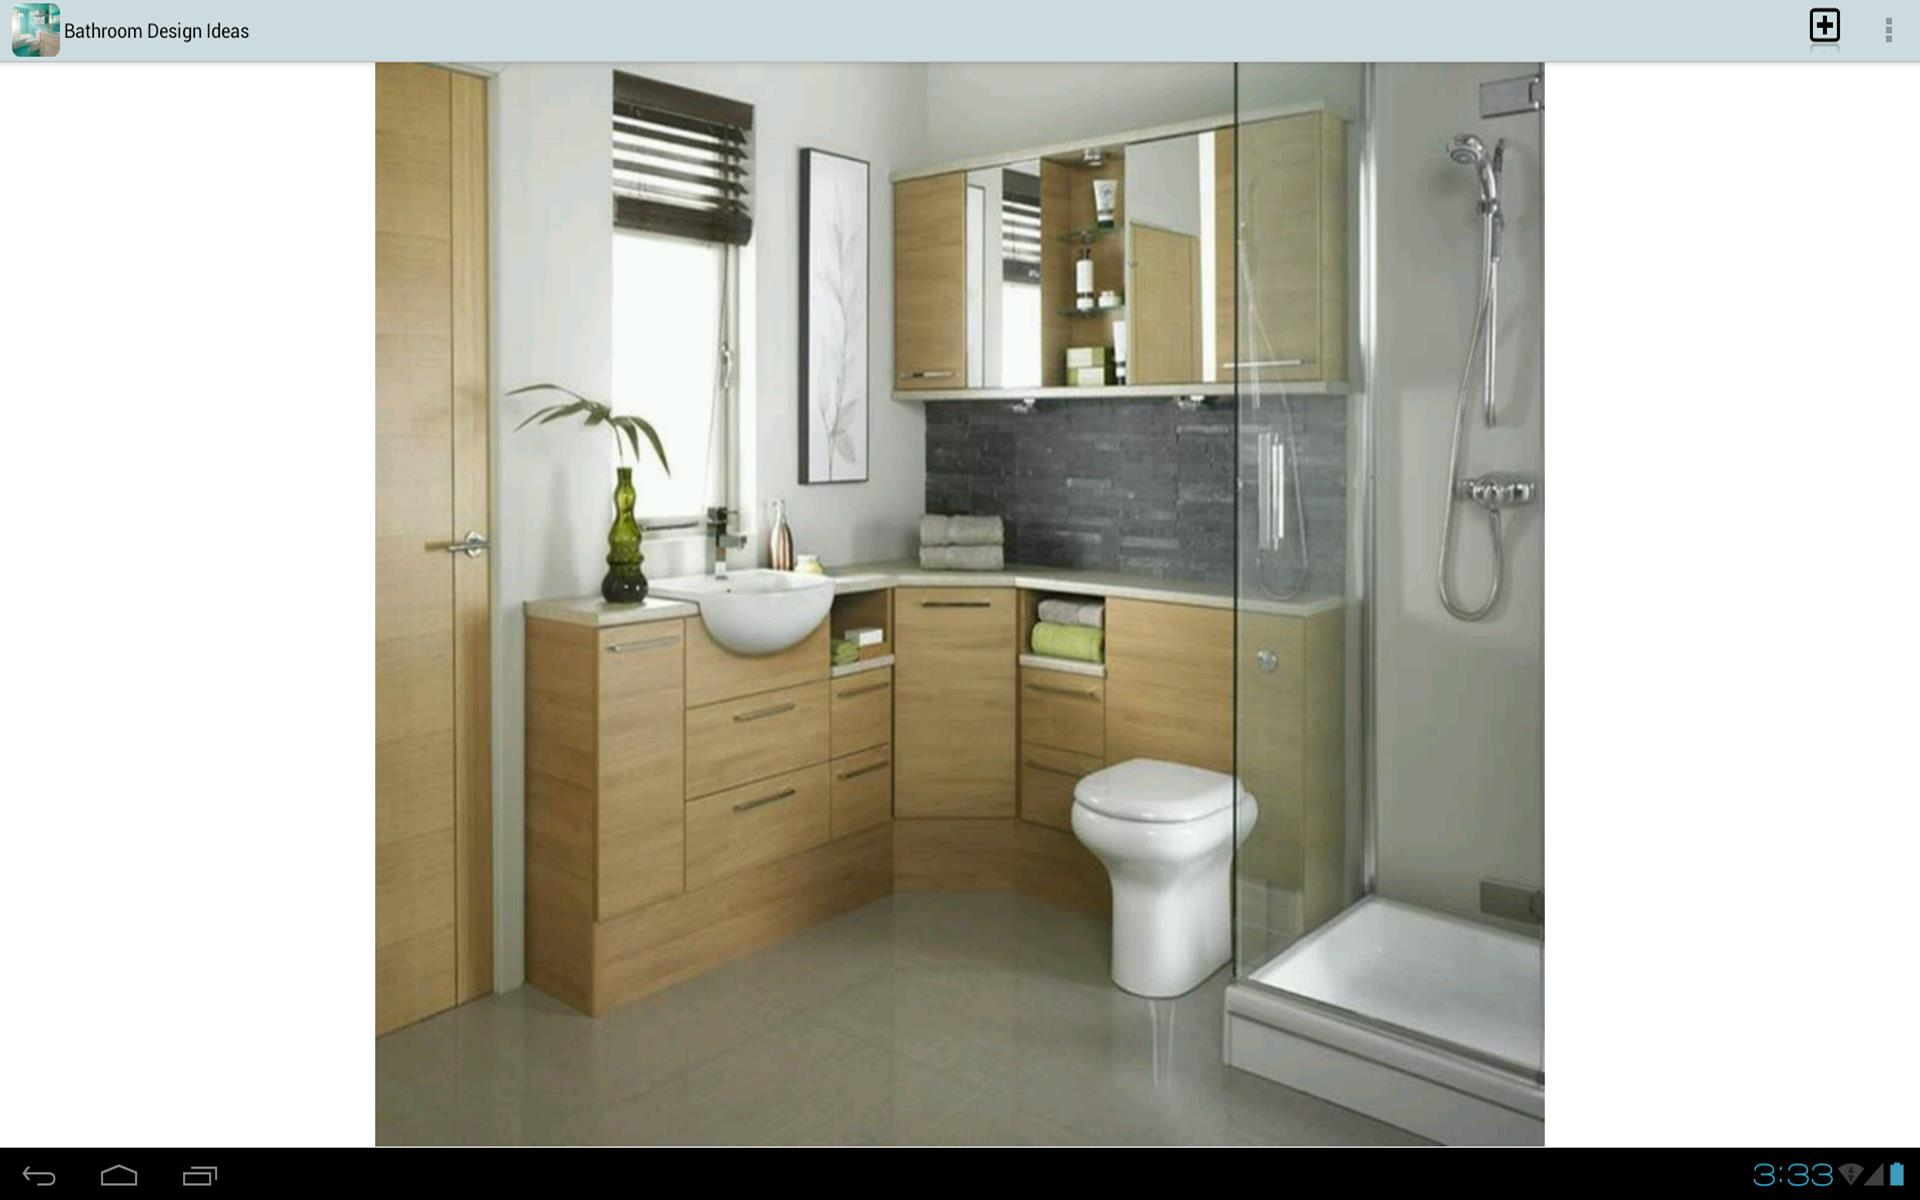 Bathroom design ideas amazon appstore for Bathroom ideas amazon